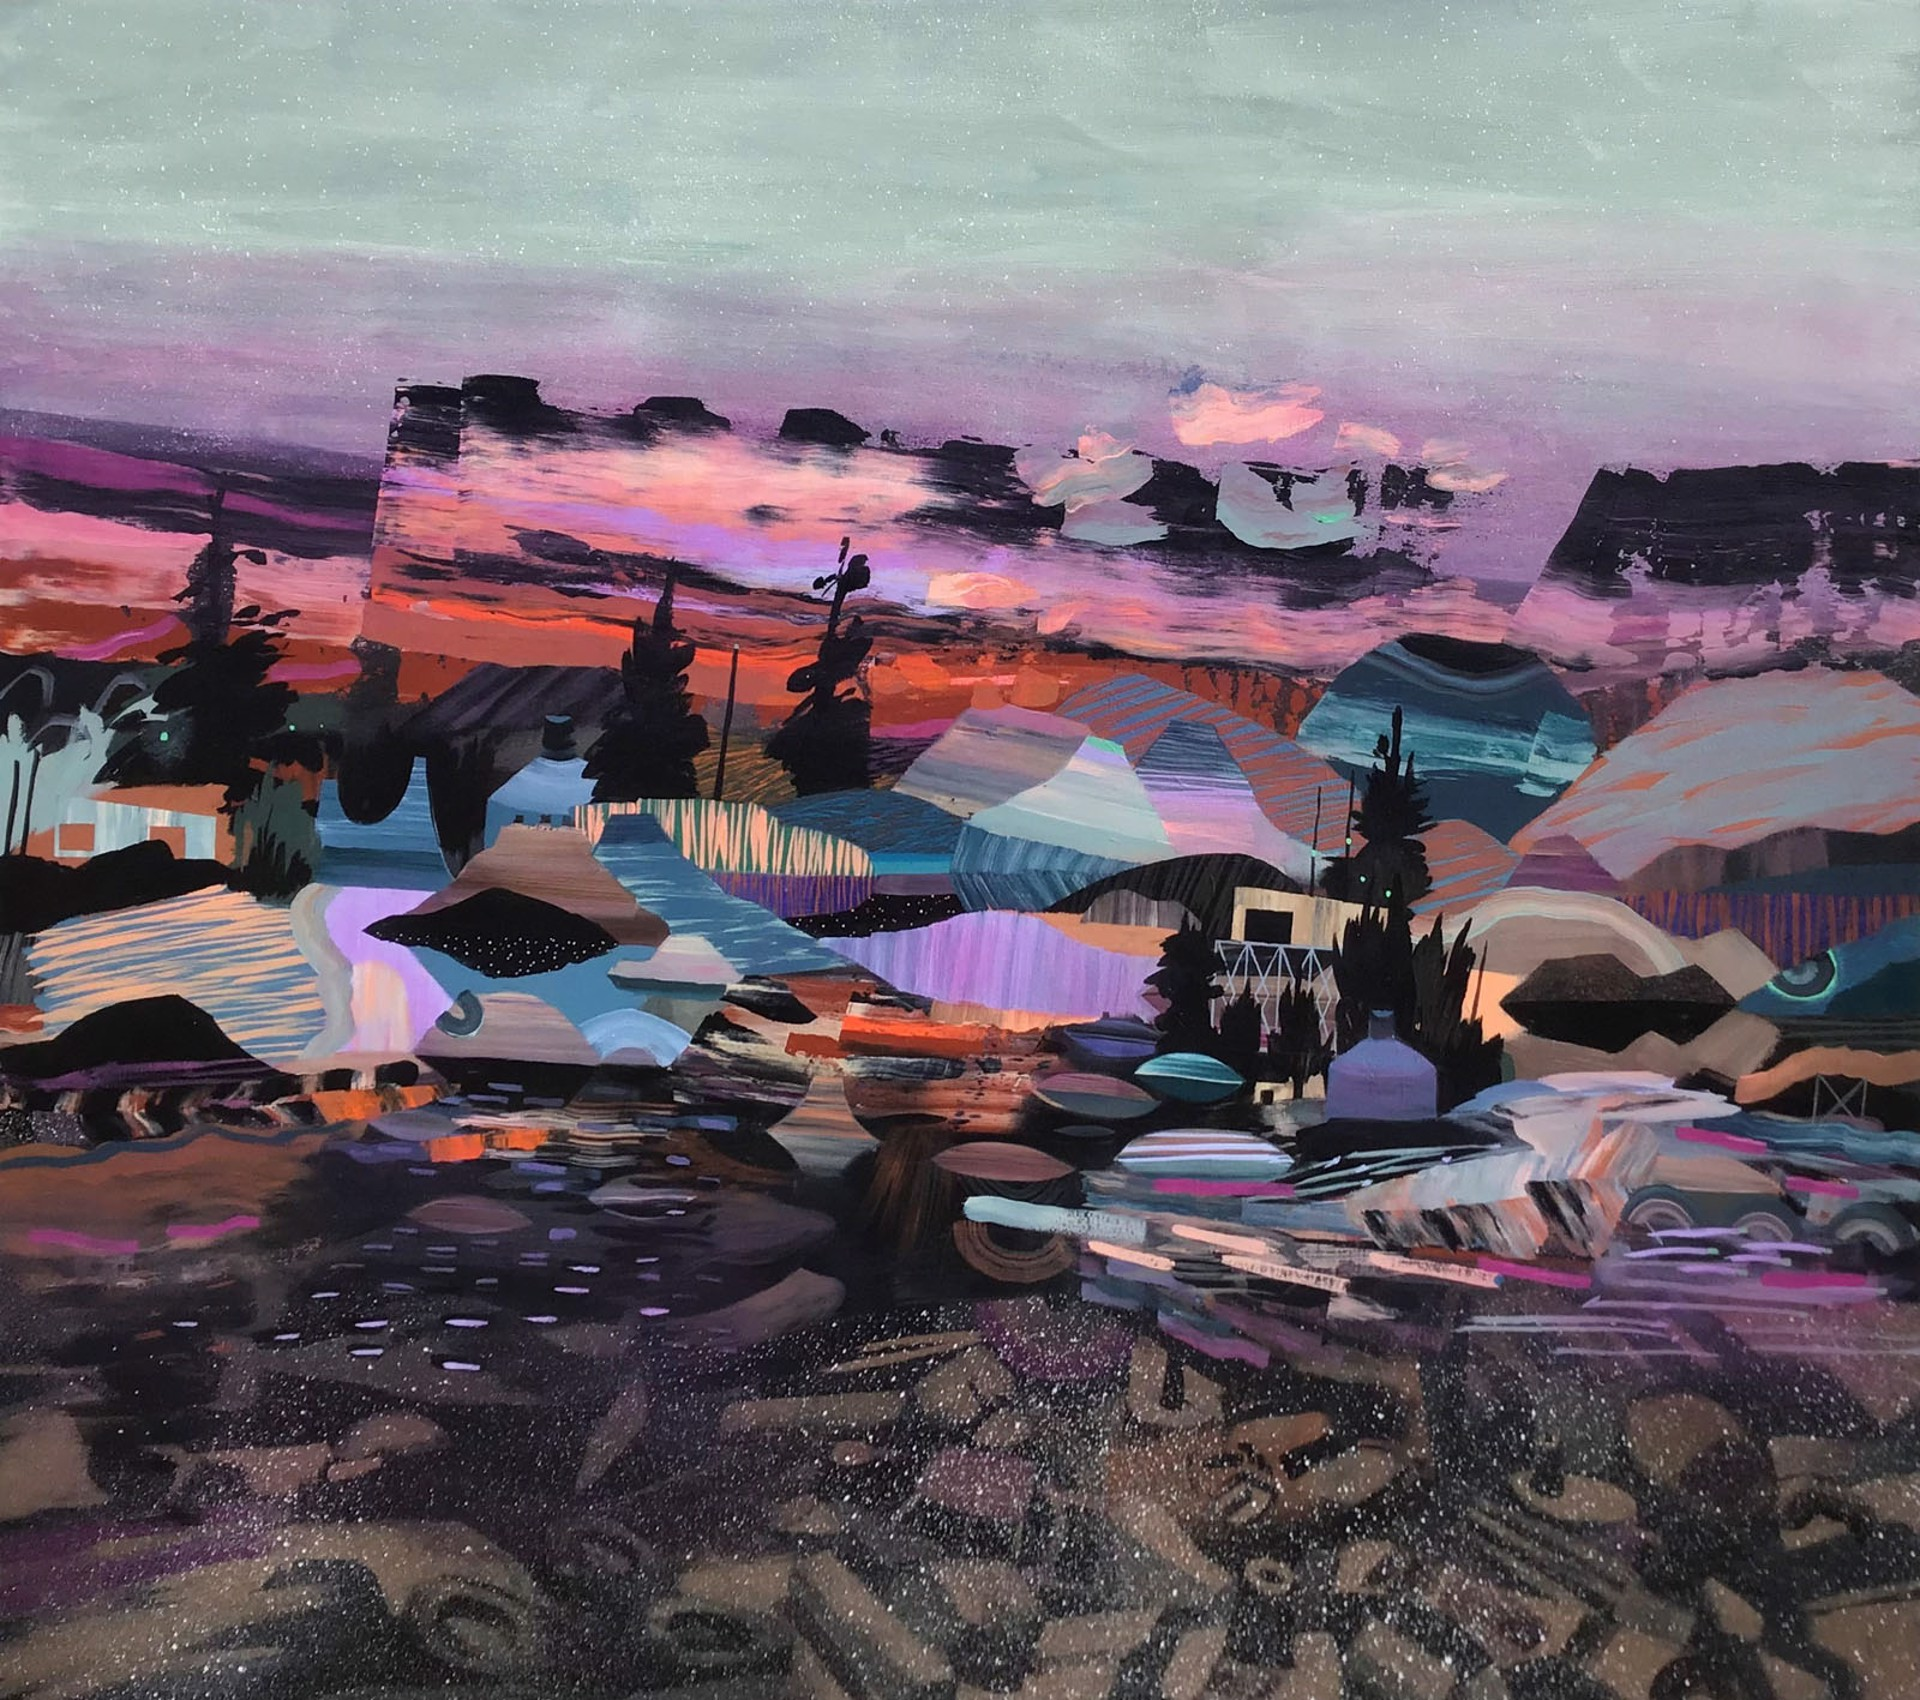 Torn Edges by Meghan Hildebrand